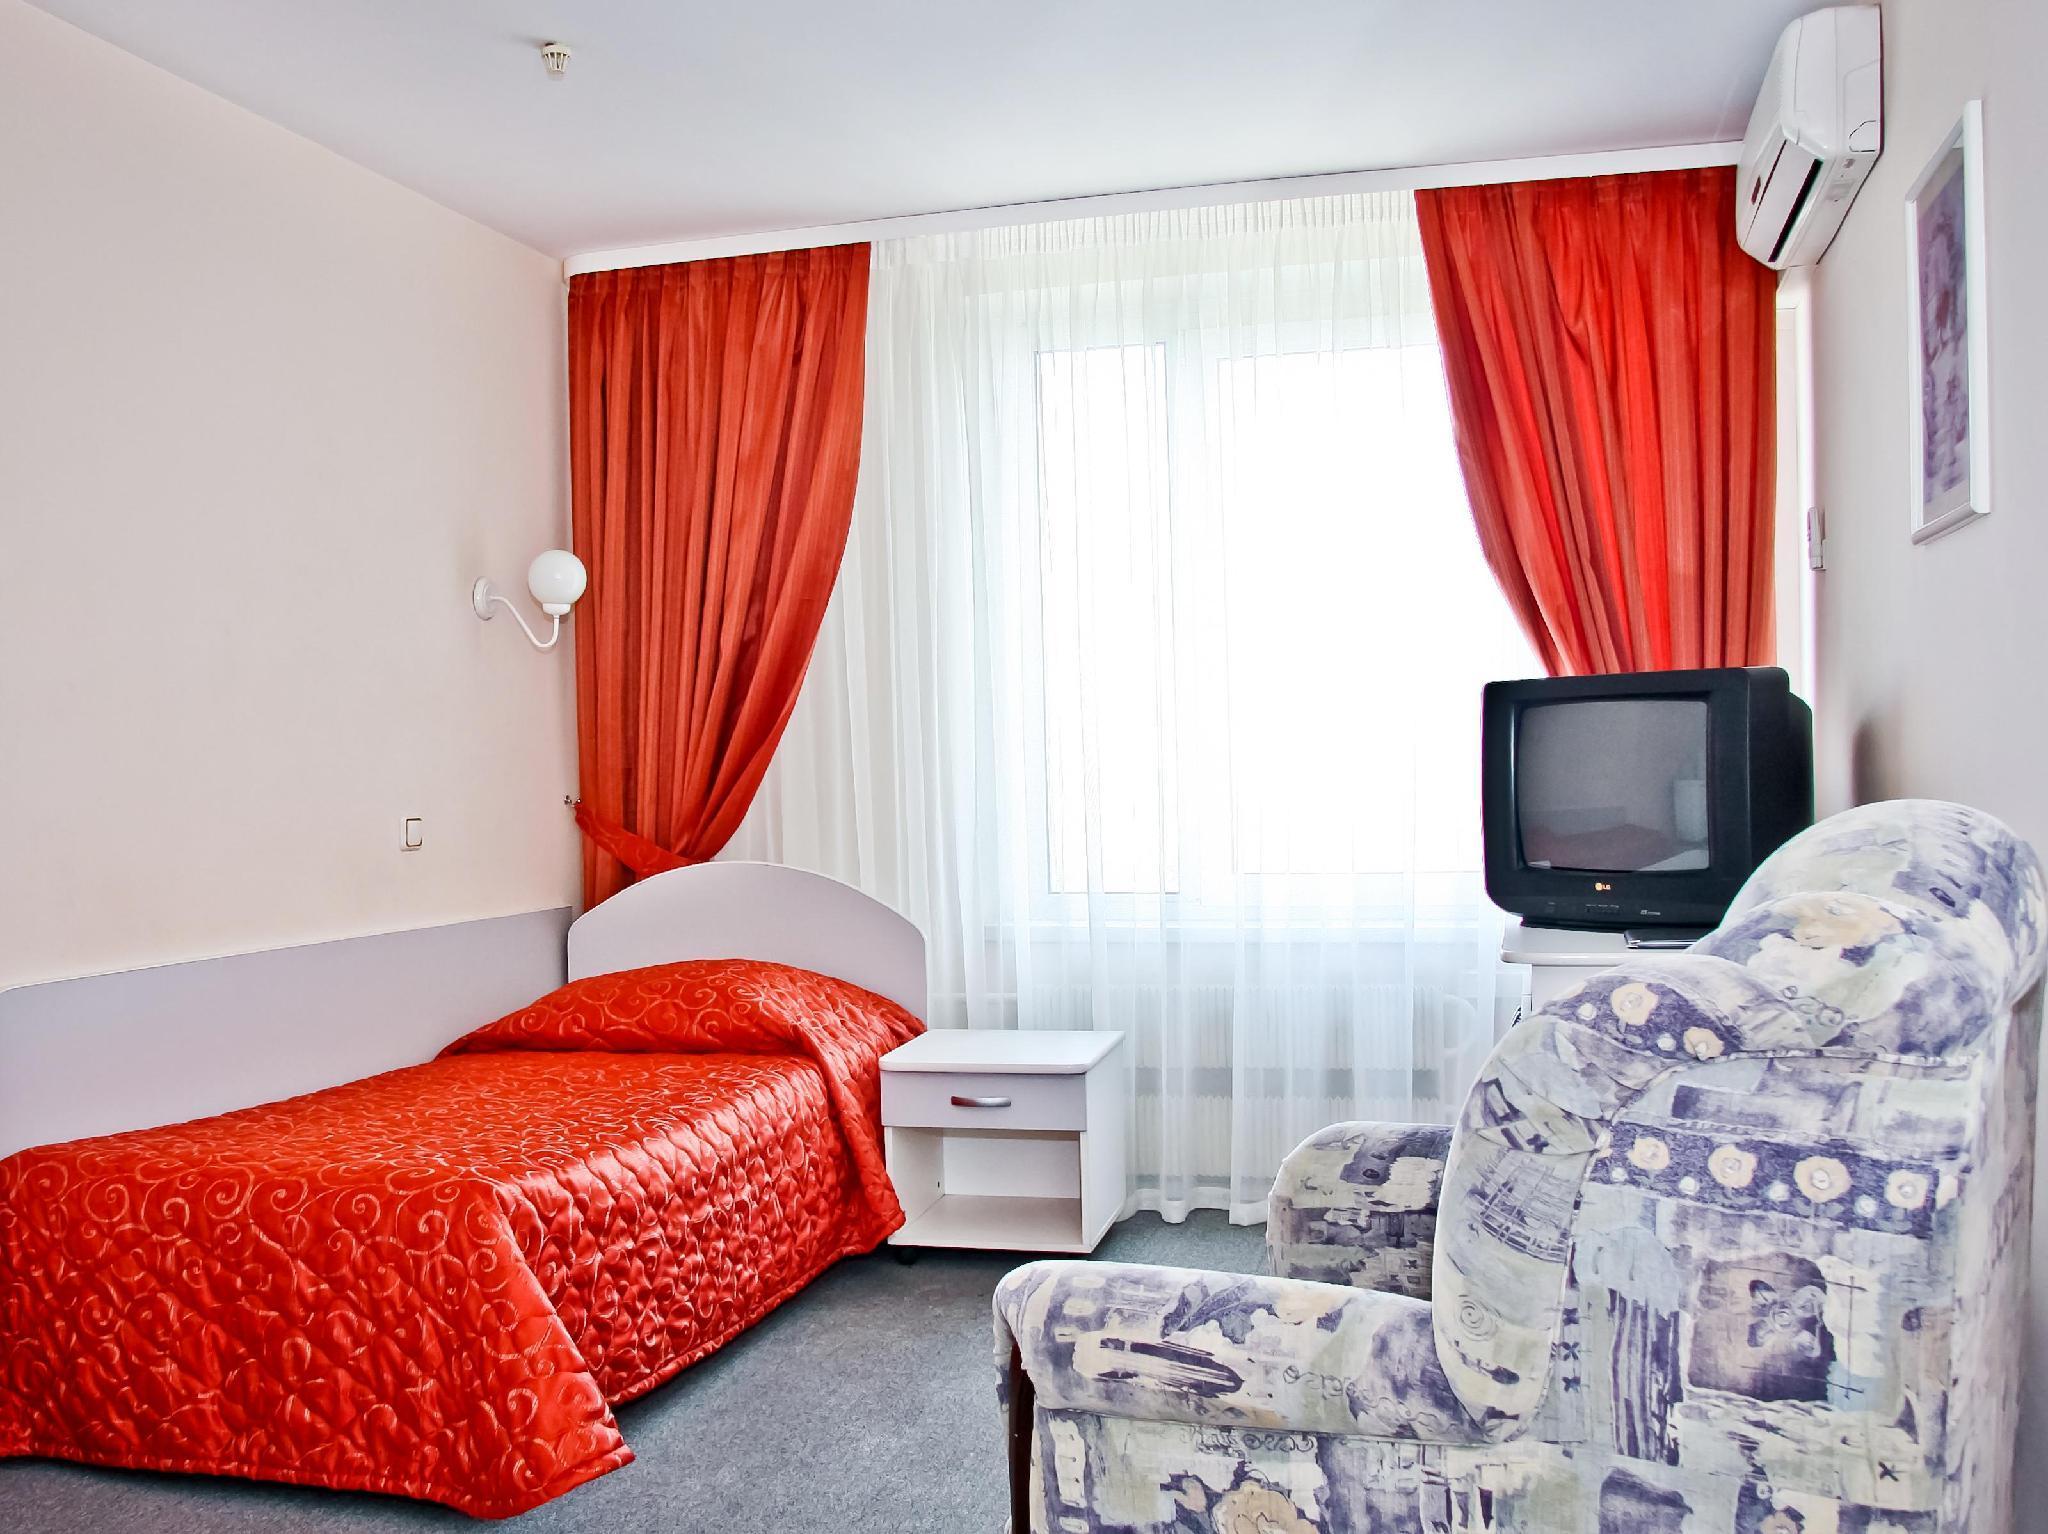 Best Price on Zvezdnaya Hotel in Moscow + Reviews